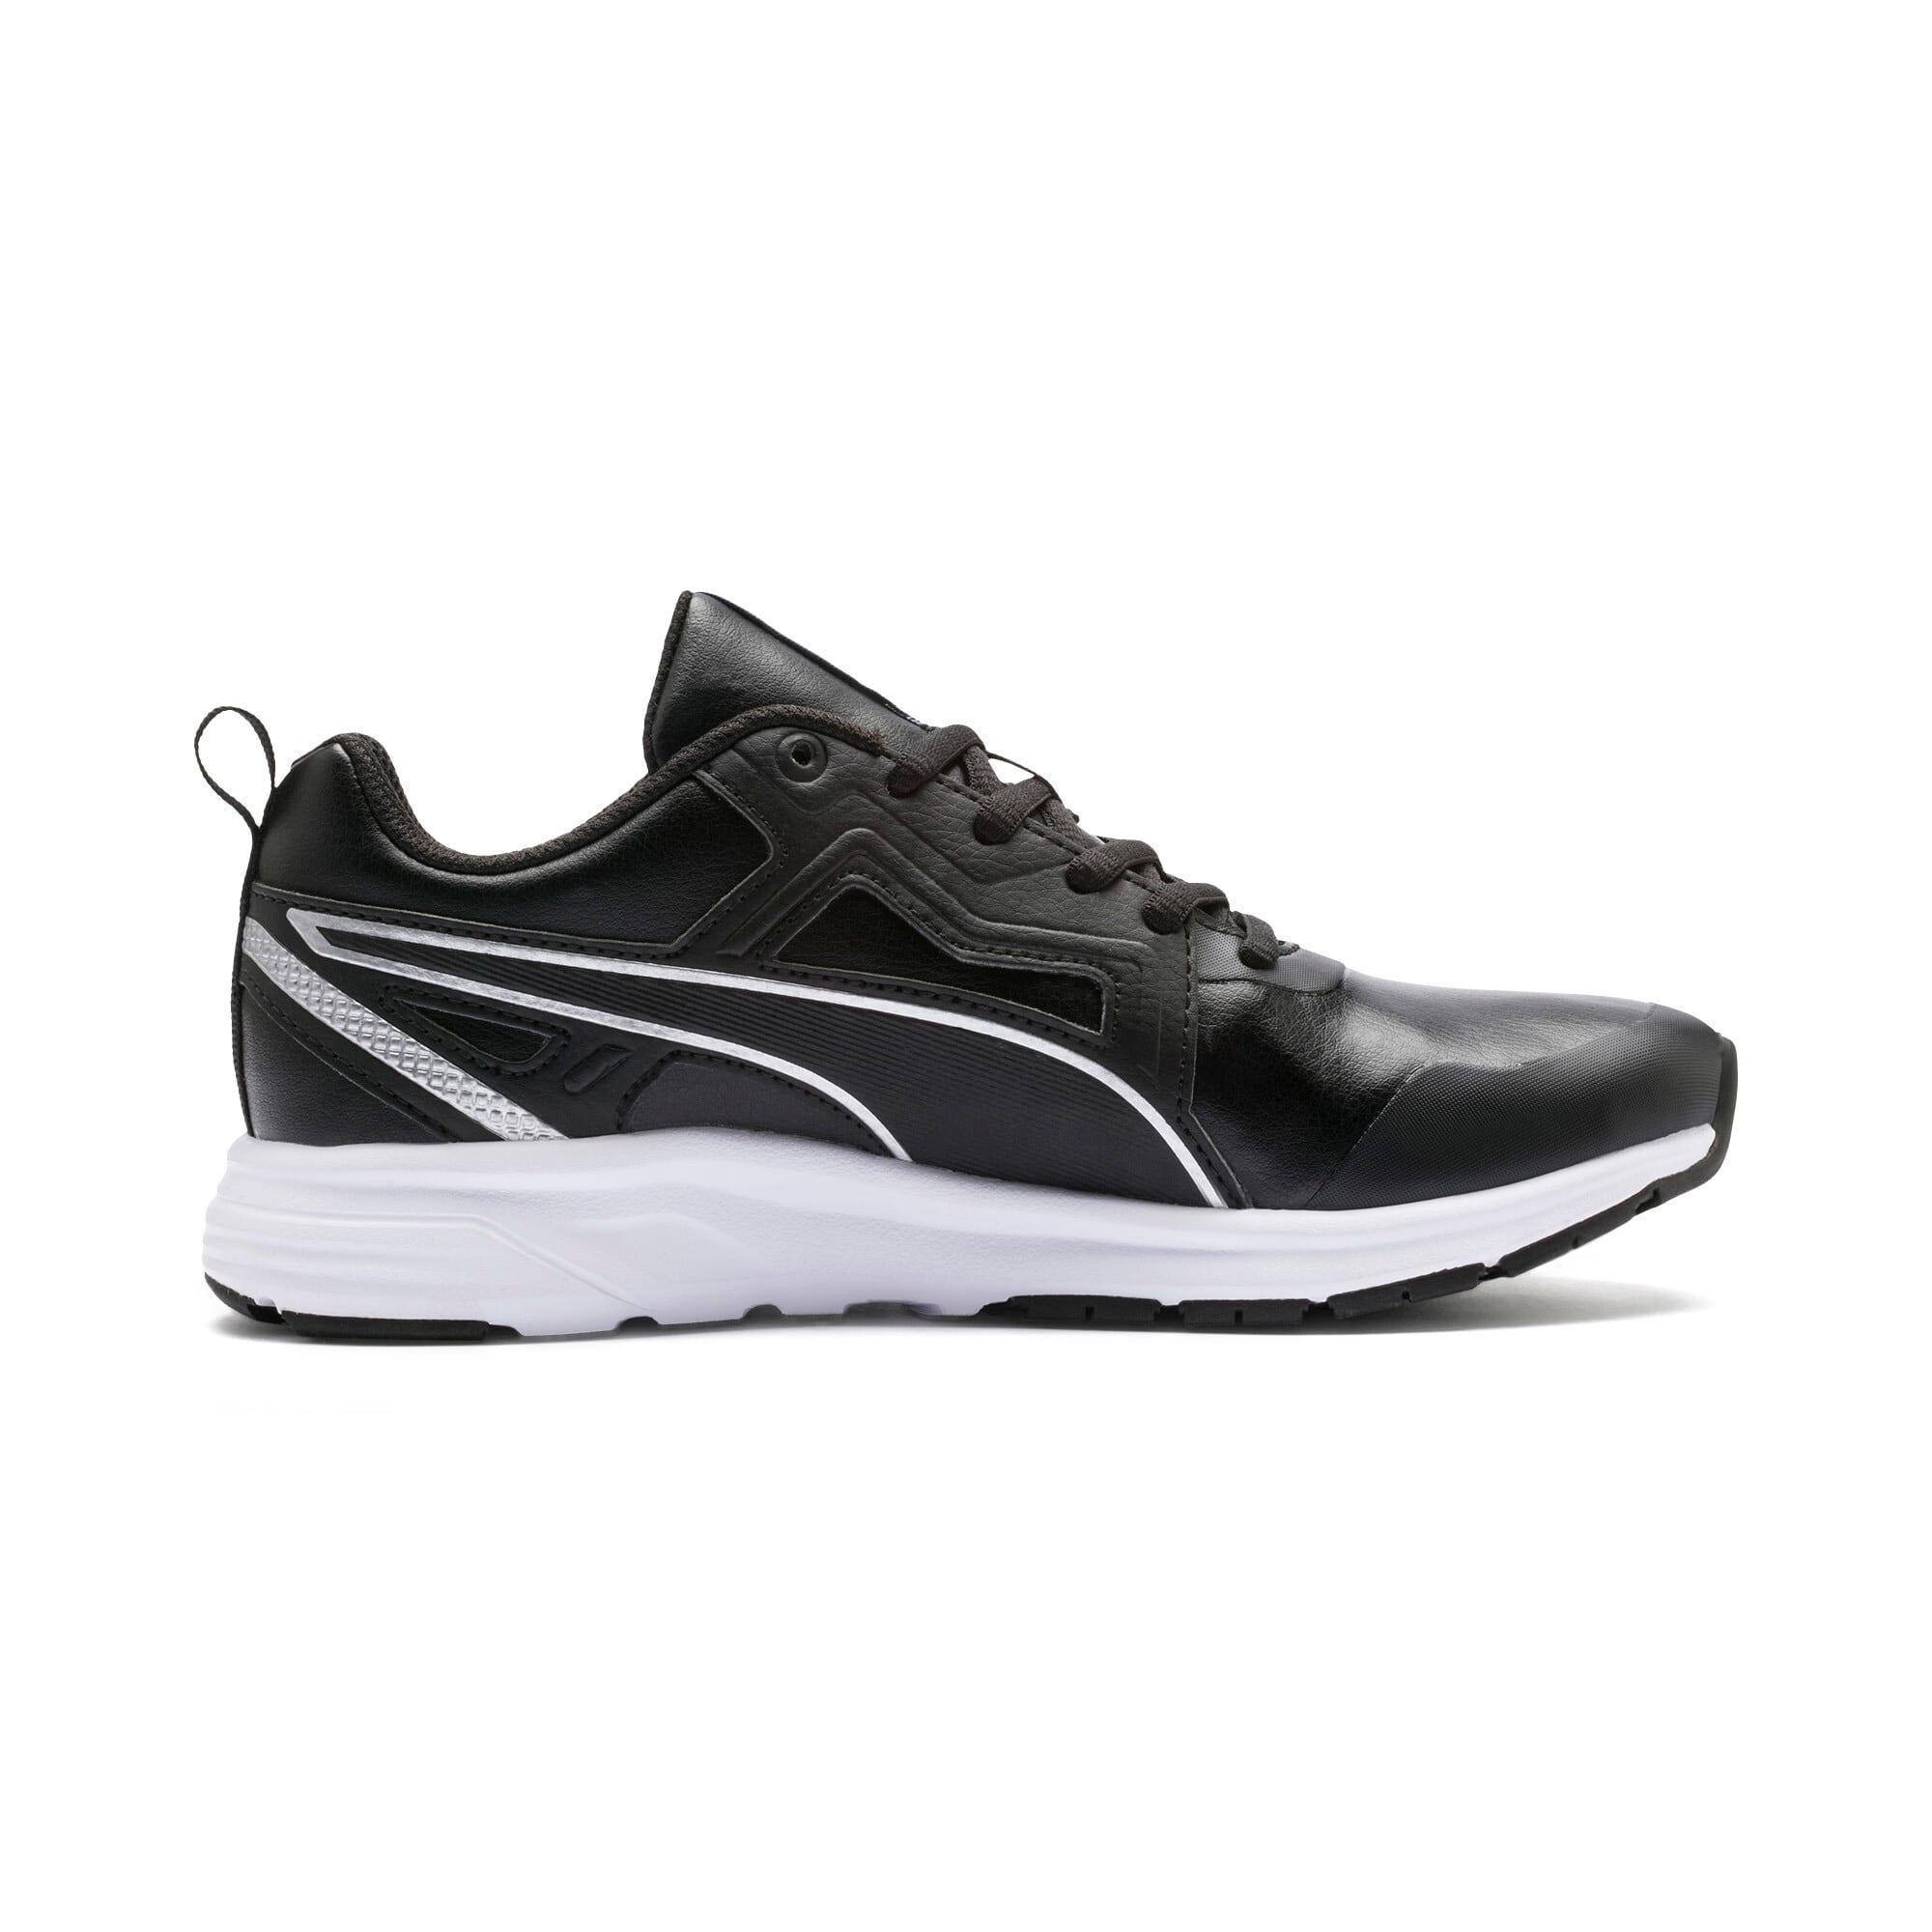 Thumbnail 5 of Pure Jogger SL Sneakers JR, Puma Black-Puma Silver-White, medium